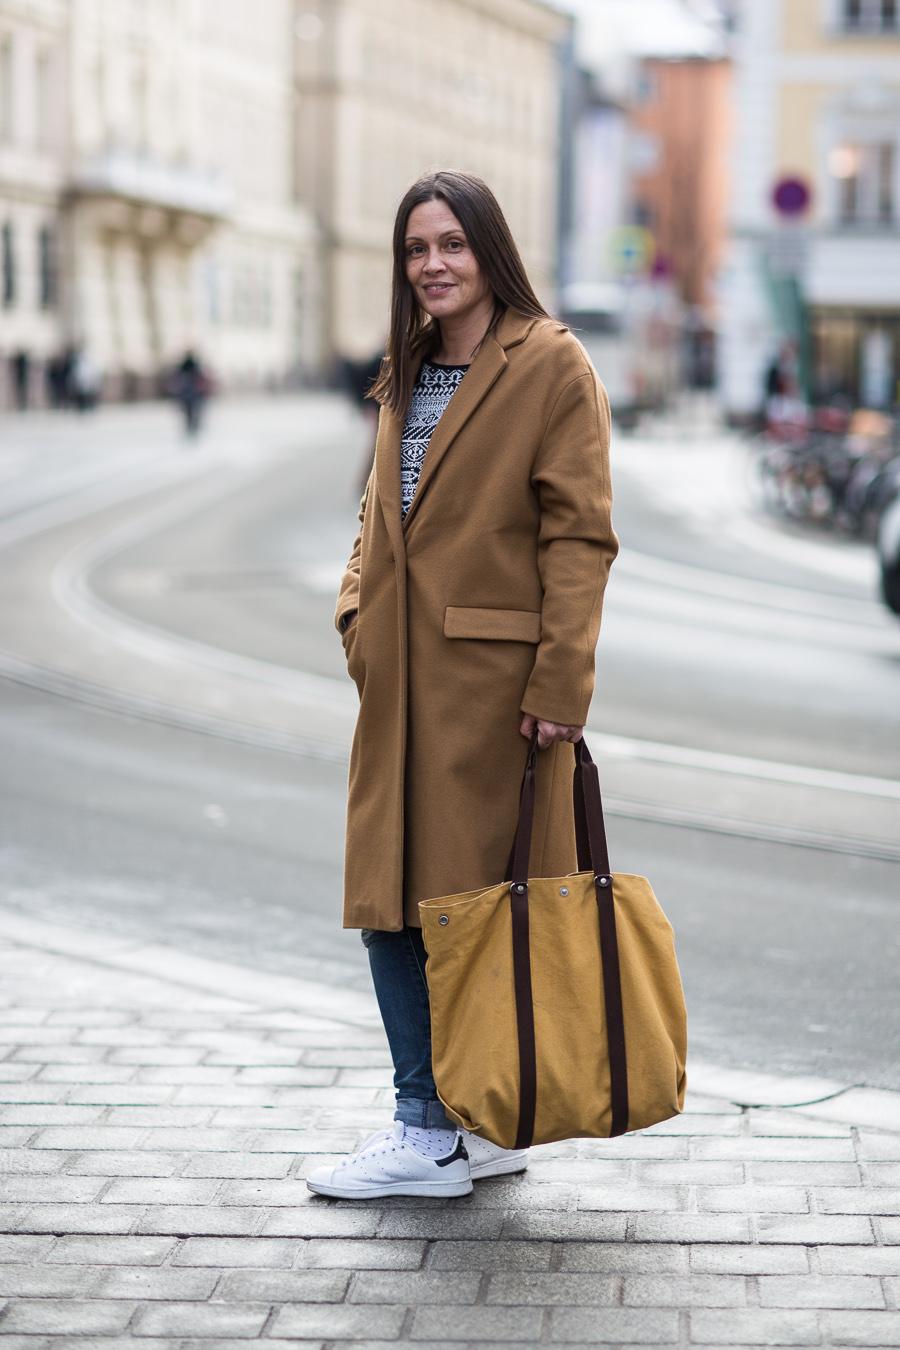 street-style-fashion-blog-innsbruck-olivia